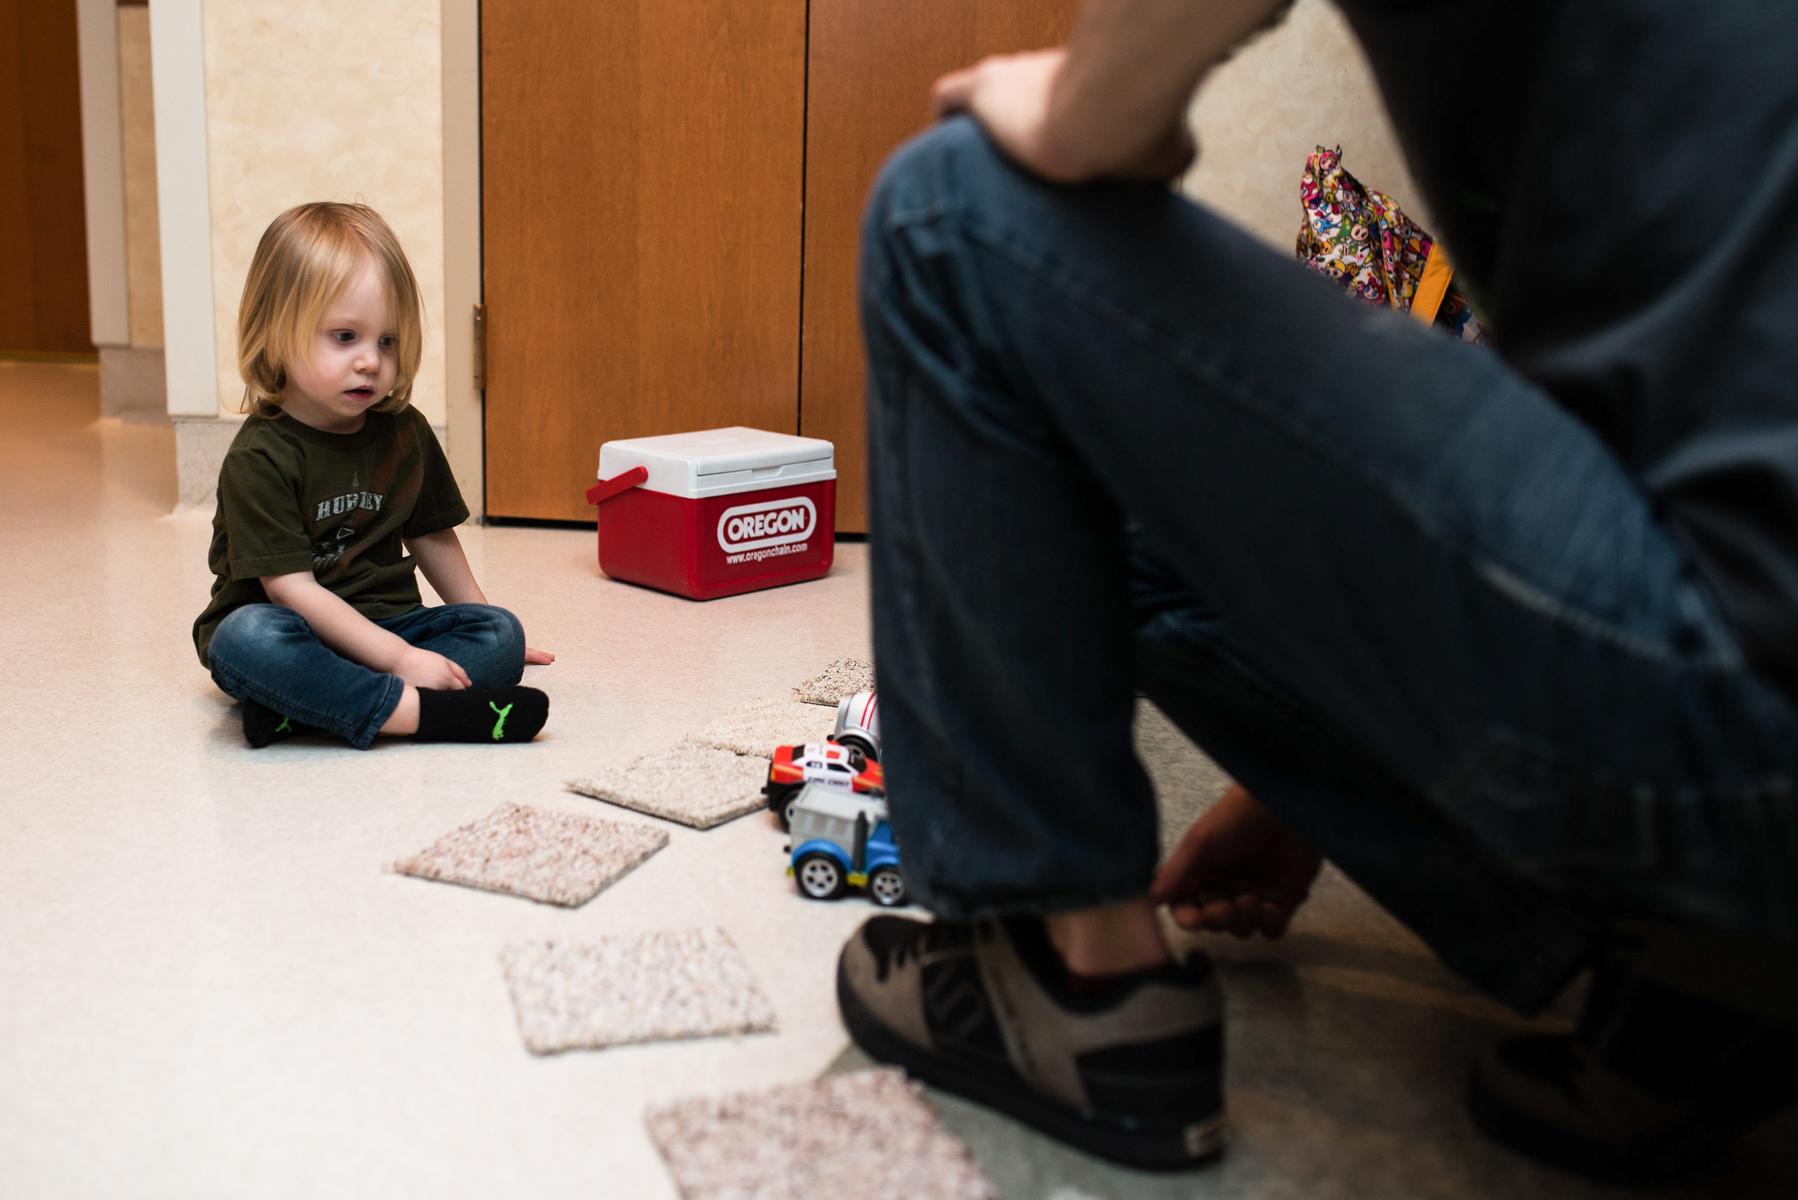 denver-birth-photographer-older-brother-waits